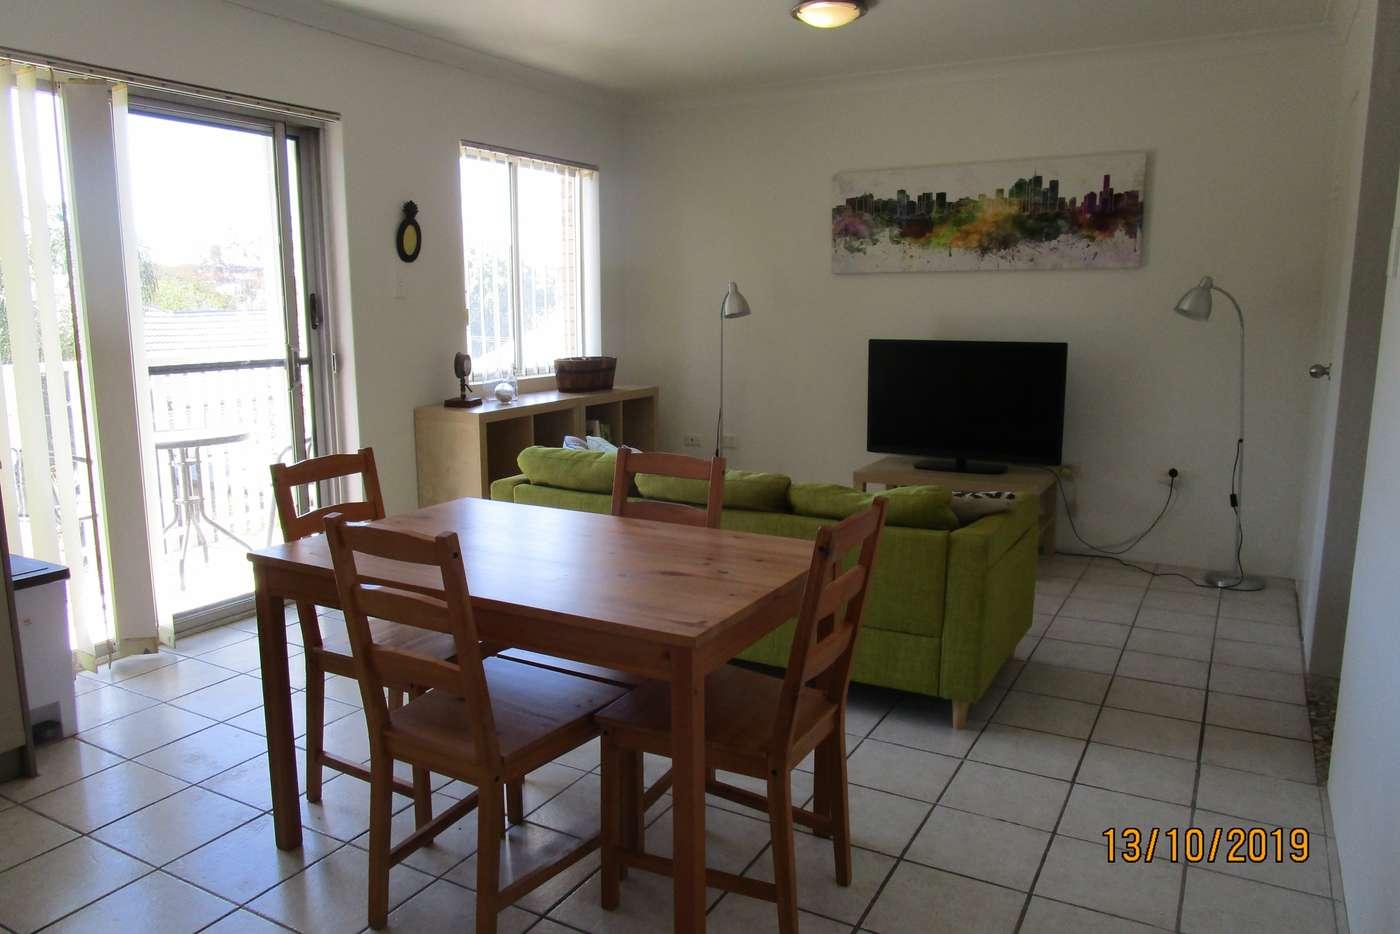 Main view of Homely apartment listing, 9 Plunkett Street, Paddington QLD 4064